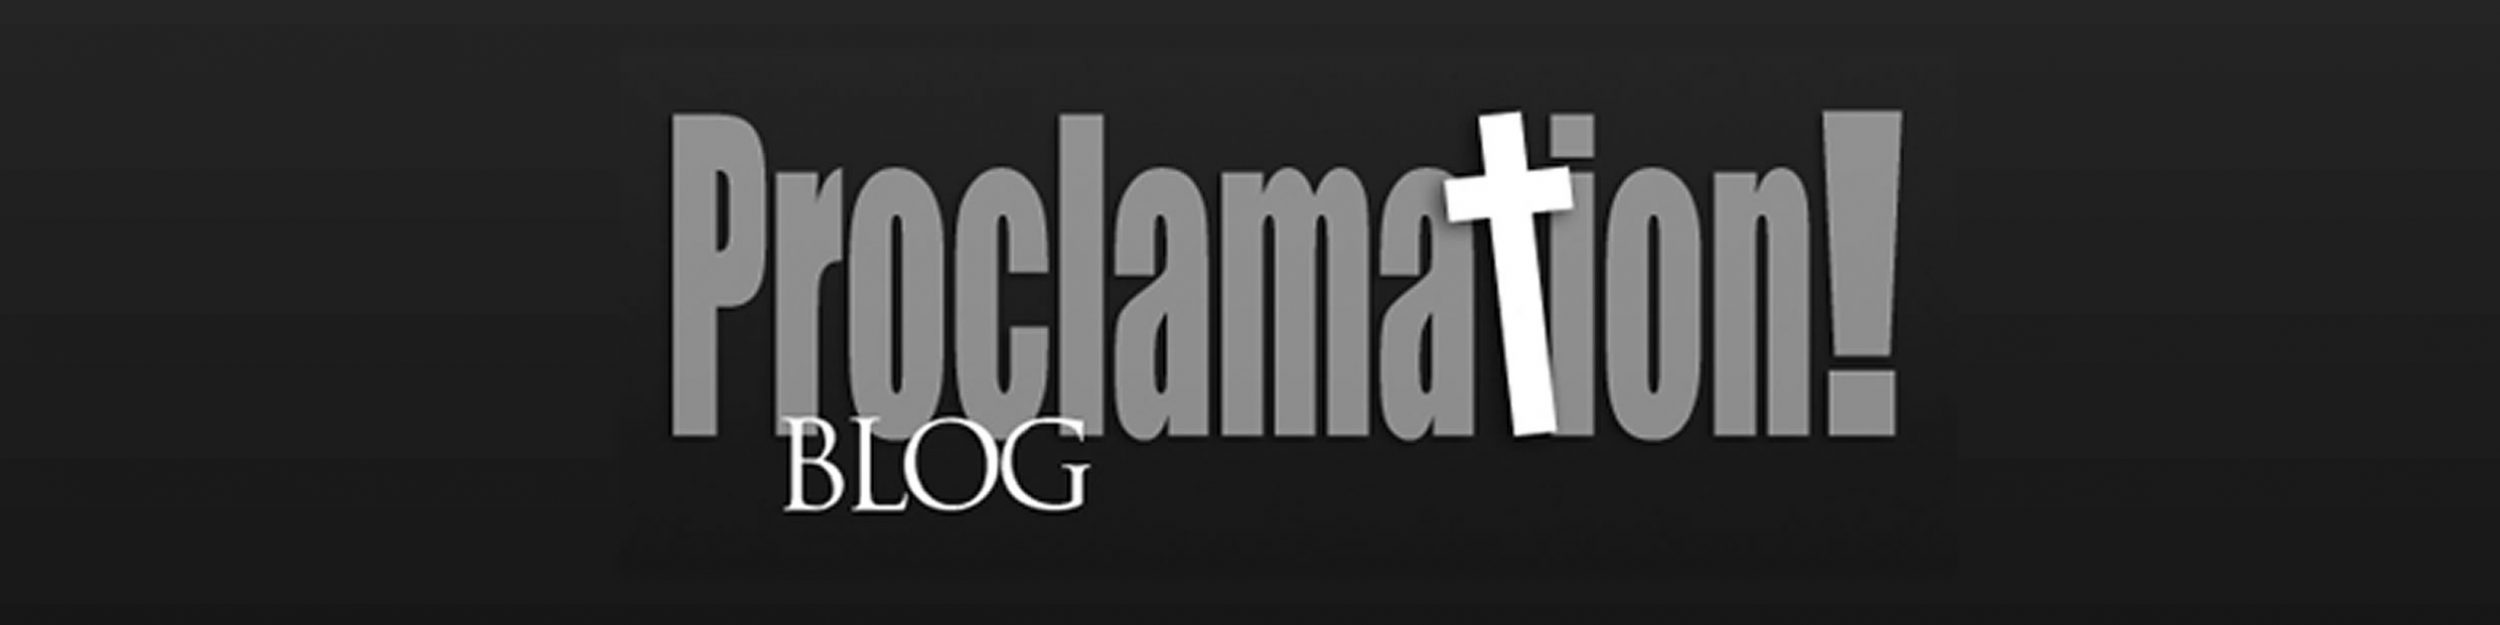 Proclamation! Blog